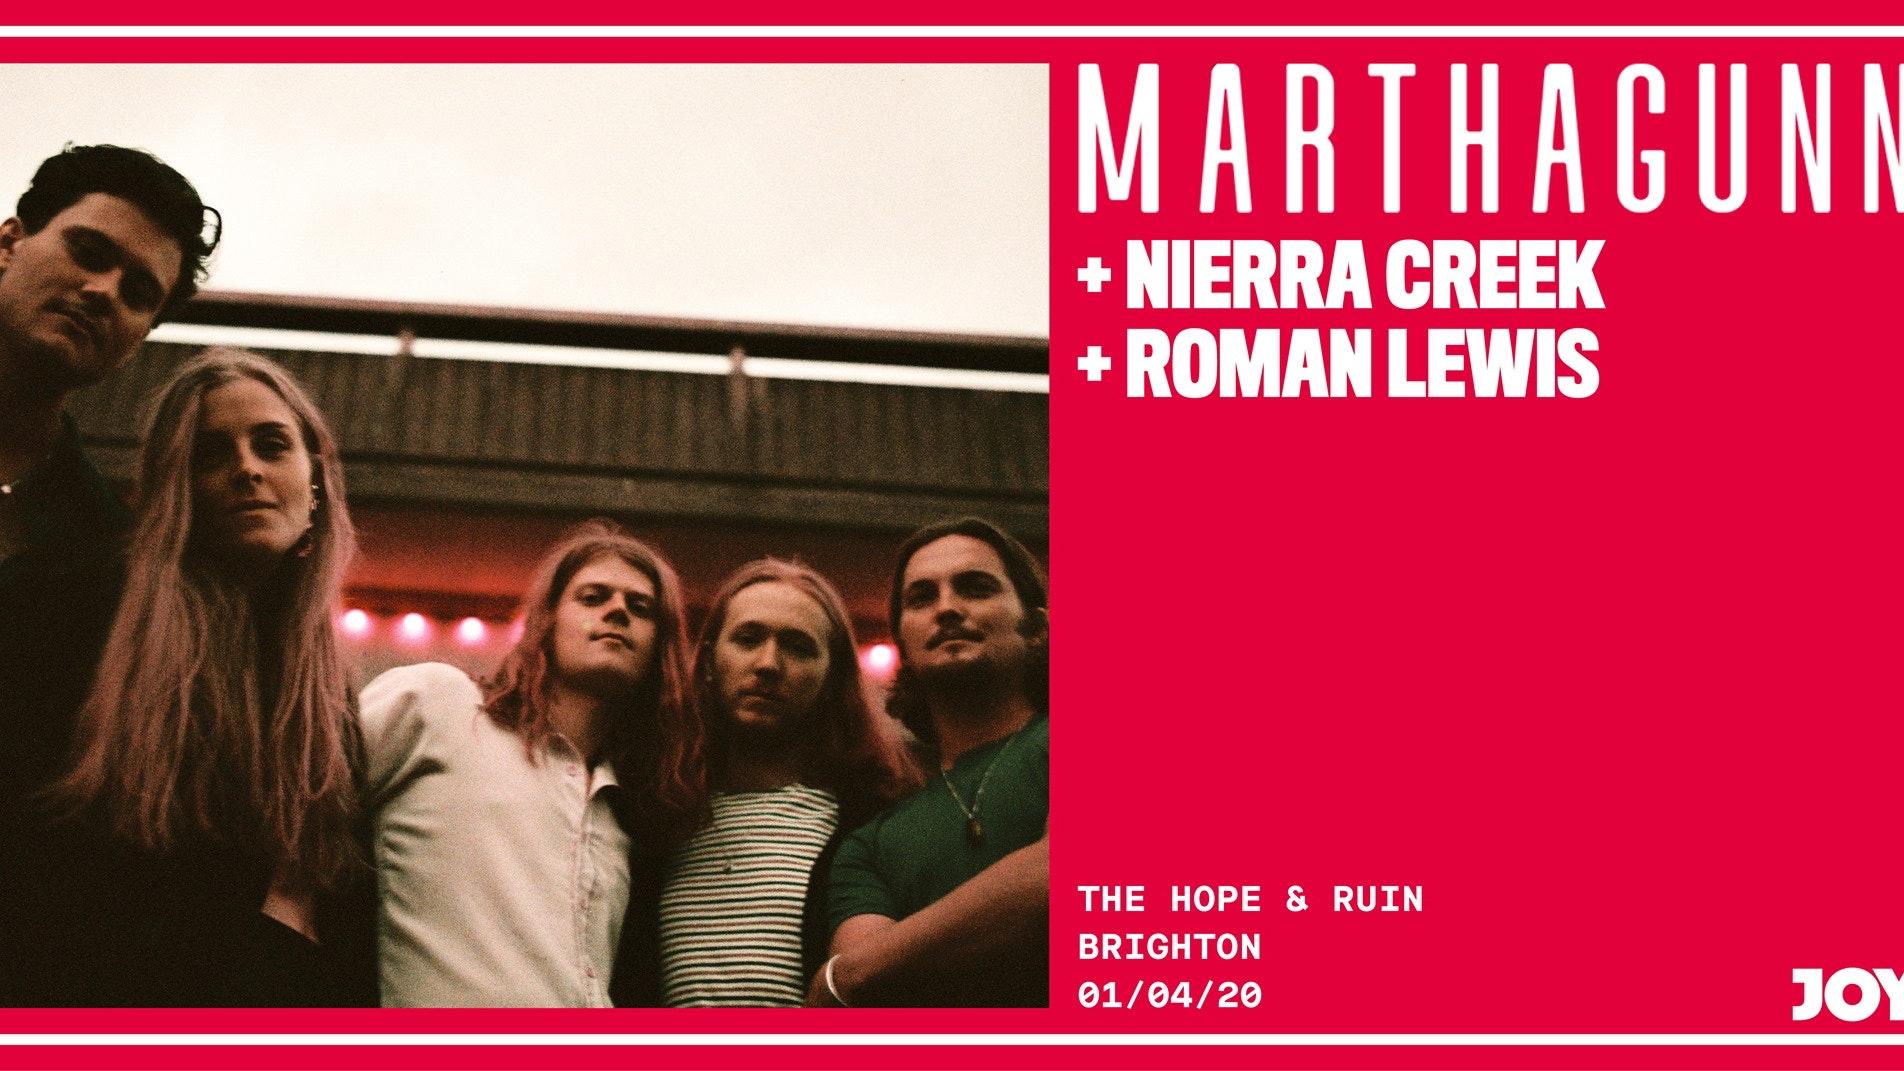 *POSTPONED* MarthaGunn + Nierra Creek + Roman Lewis